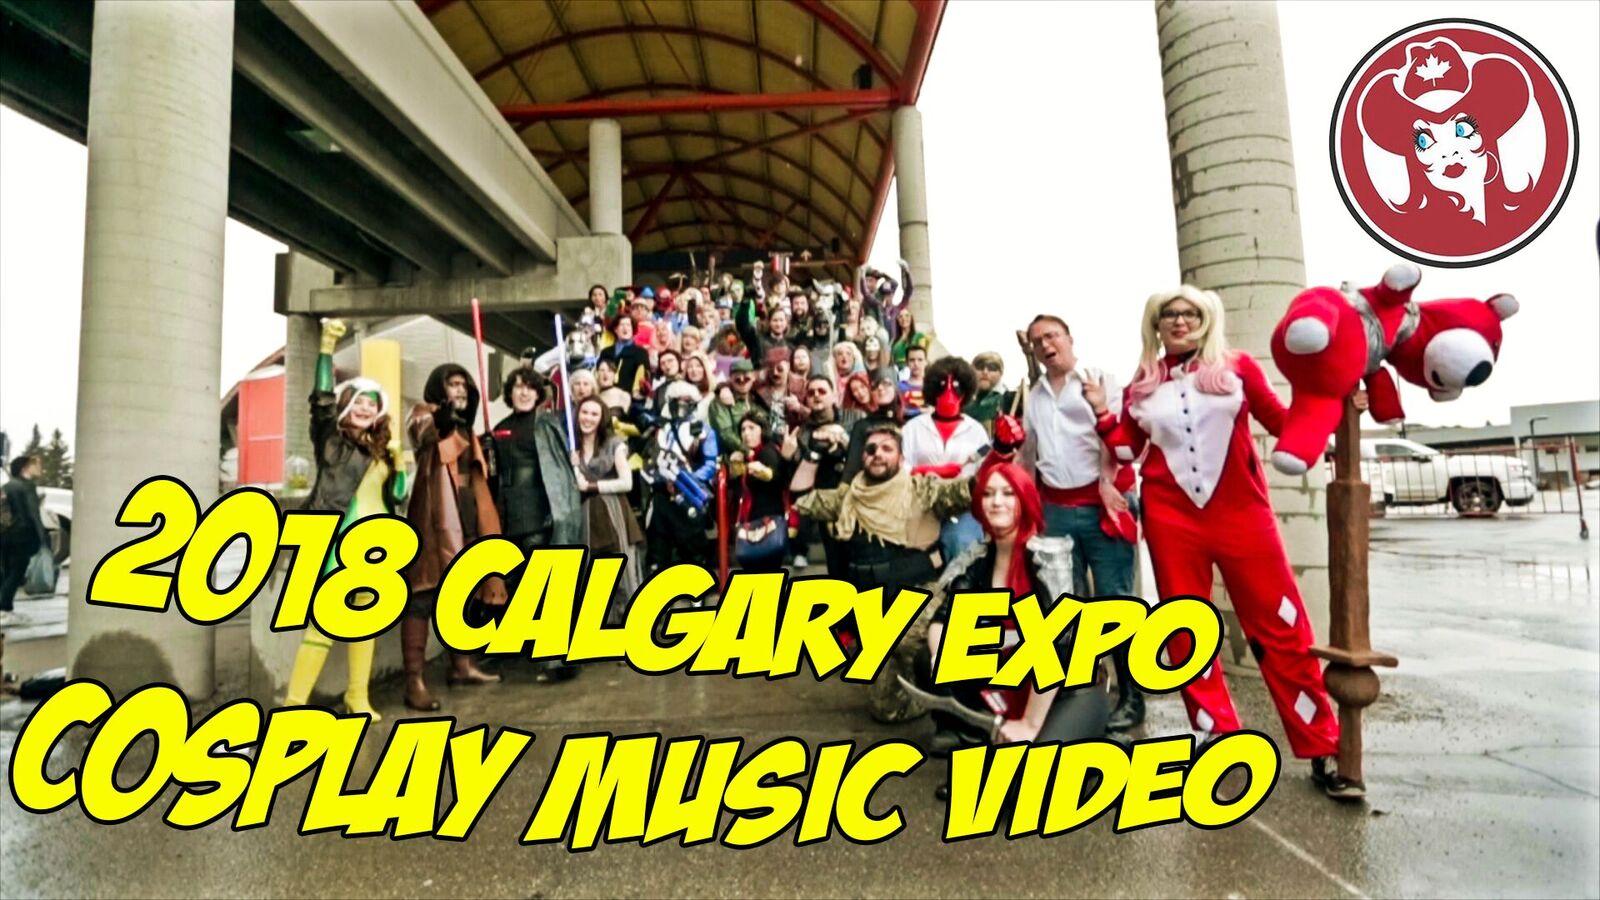 Calgary Expo 2018 - Cosplay Music Video